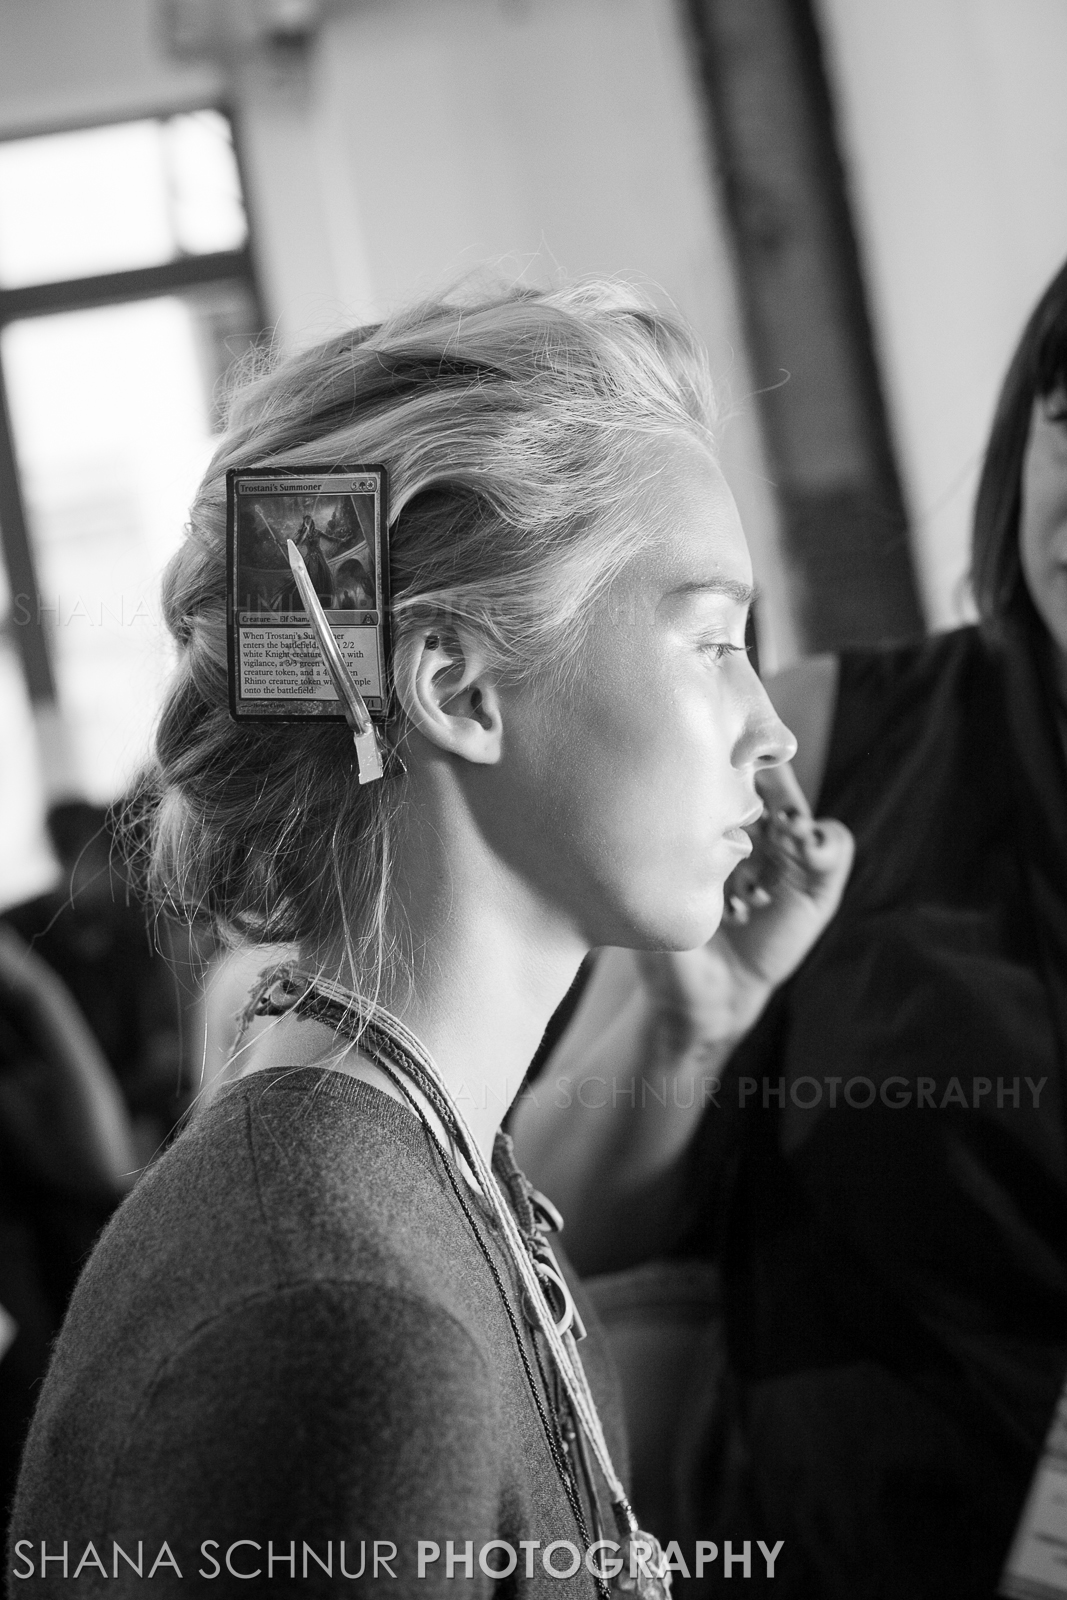 JMendel-Shana-Schnur-Photography--025-2.jpg